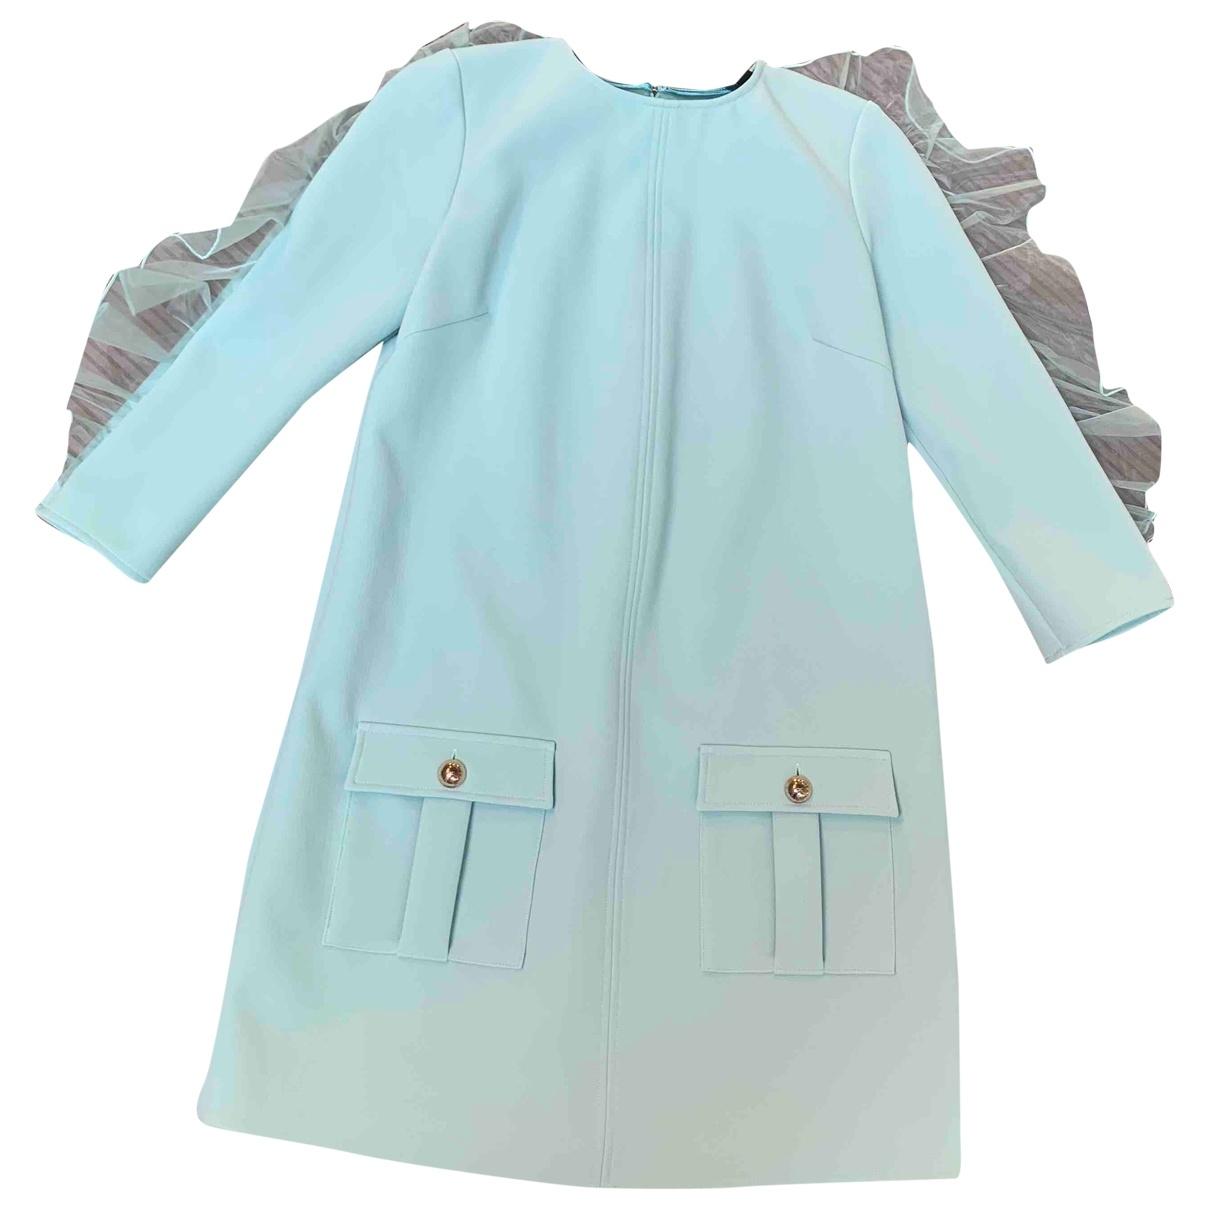 Elisabetta Franchi \N Turquoise dress for Women 42 IT